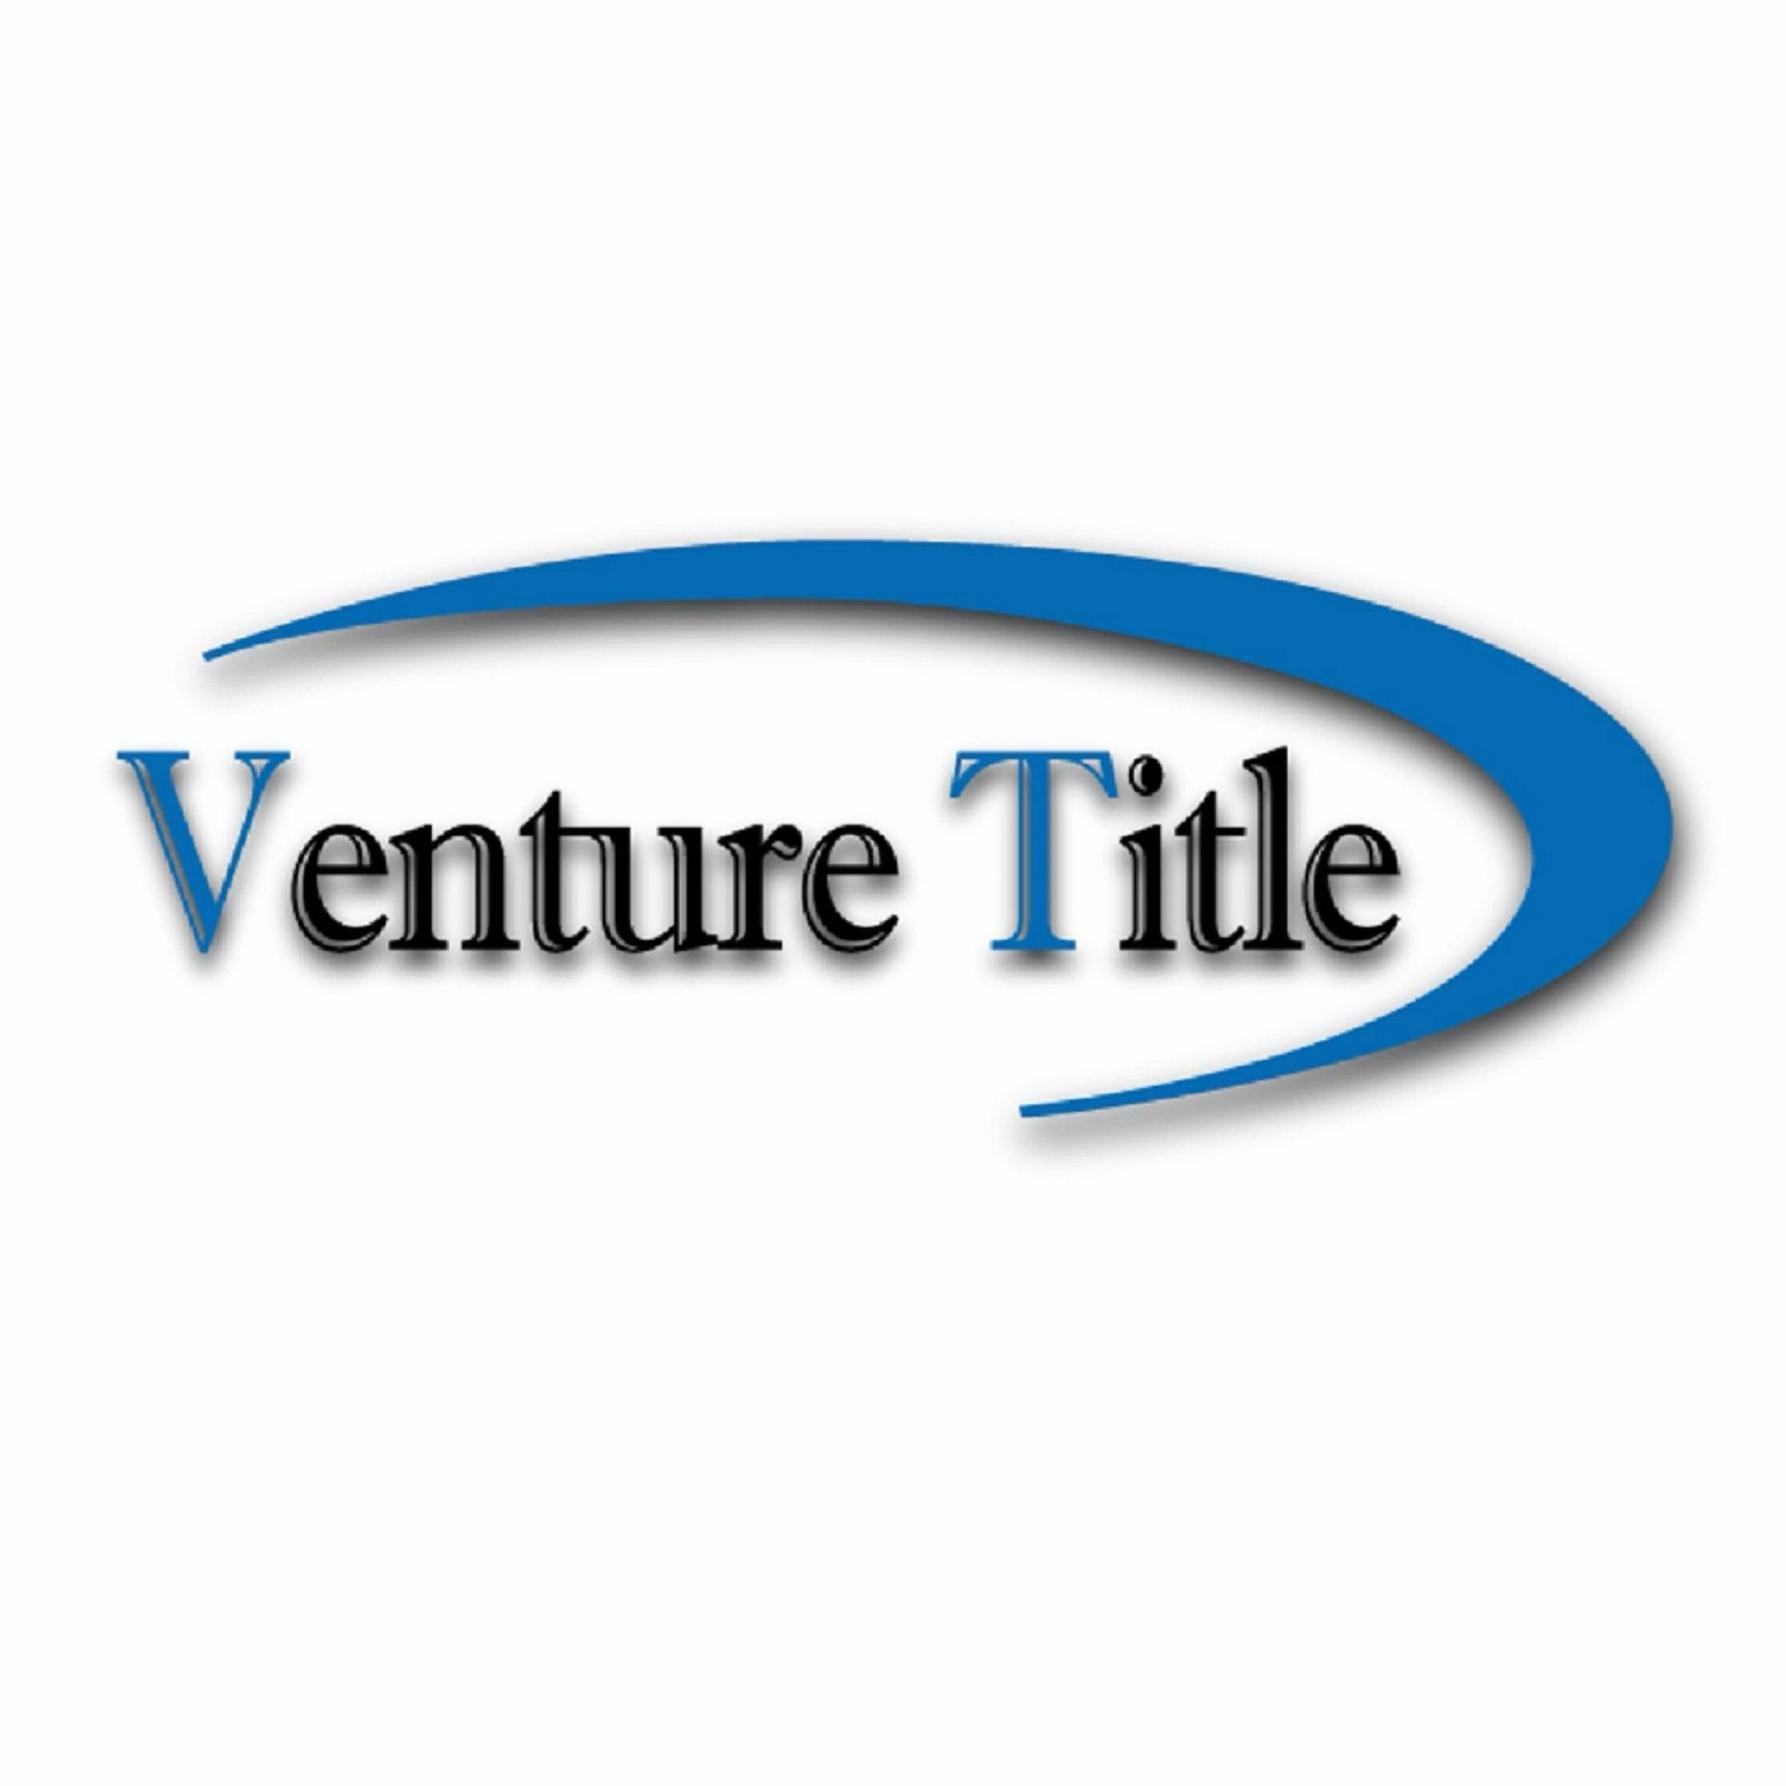 Venture Title